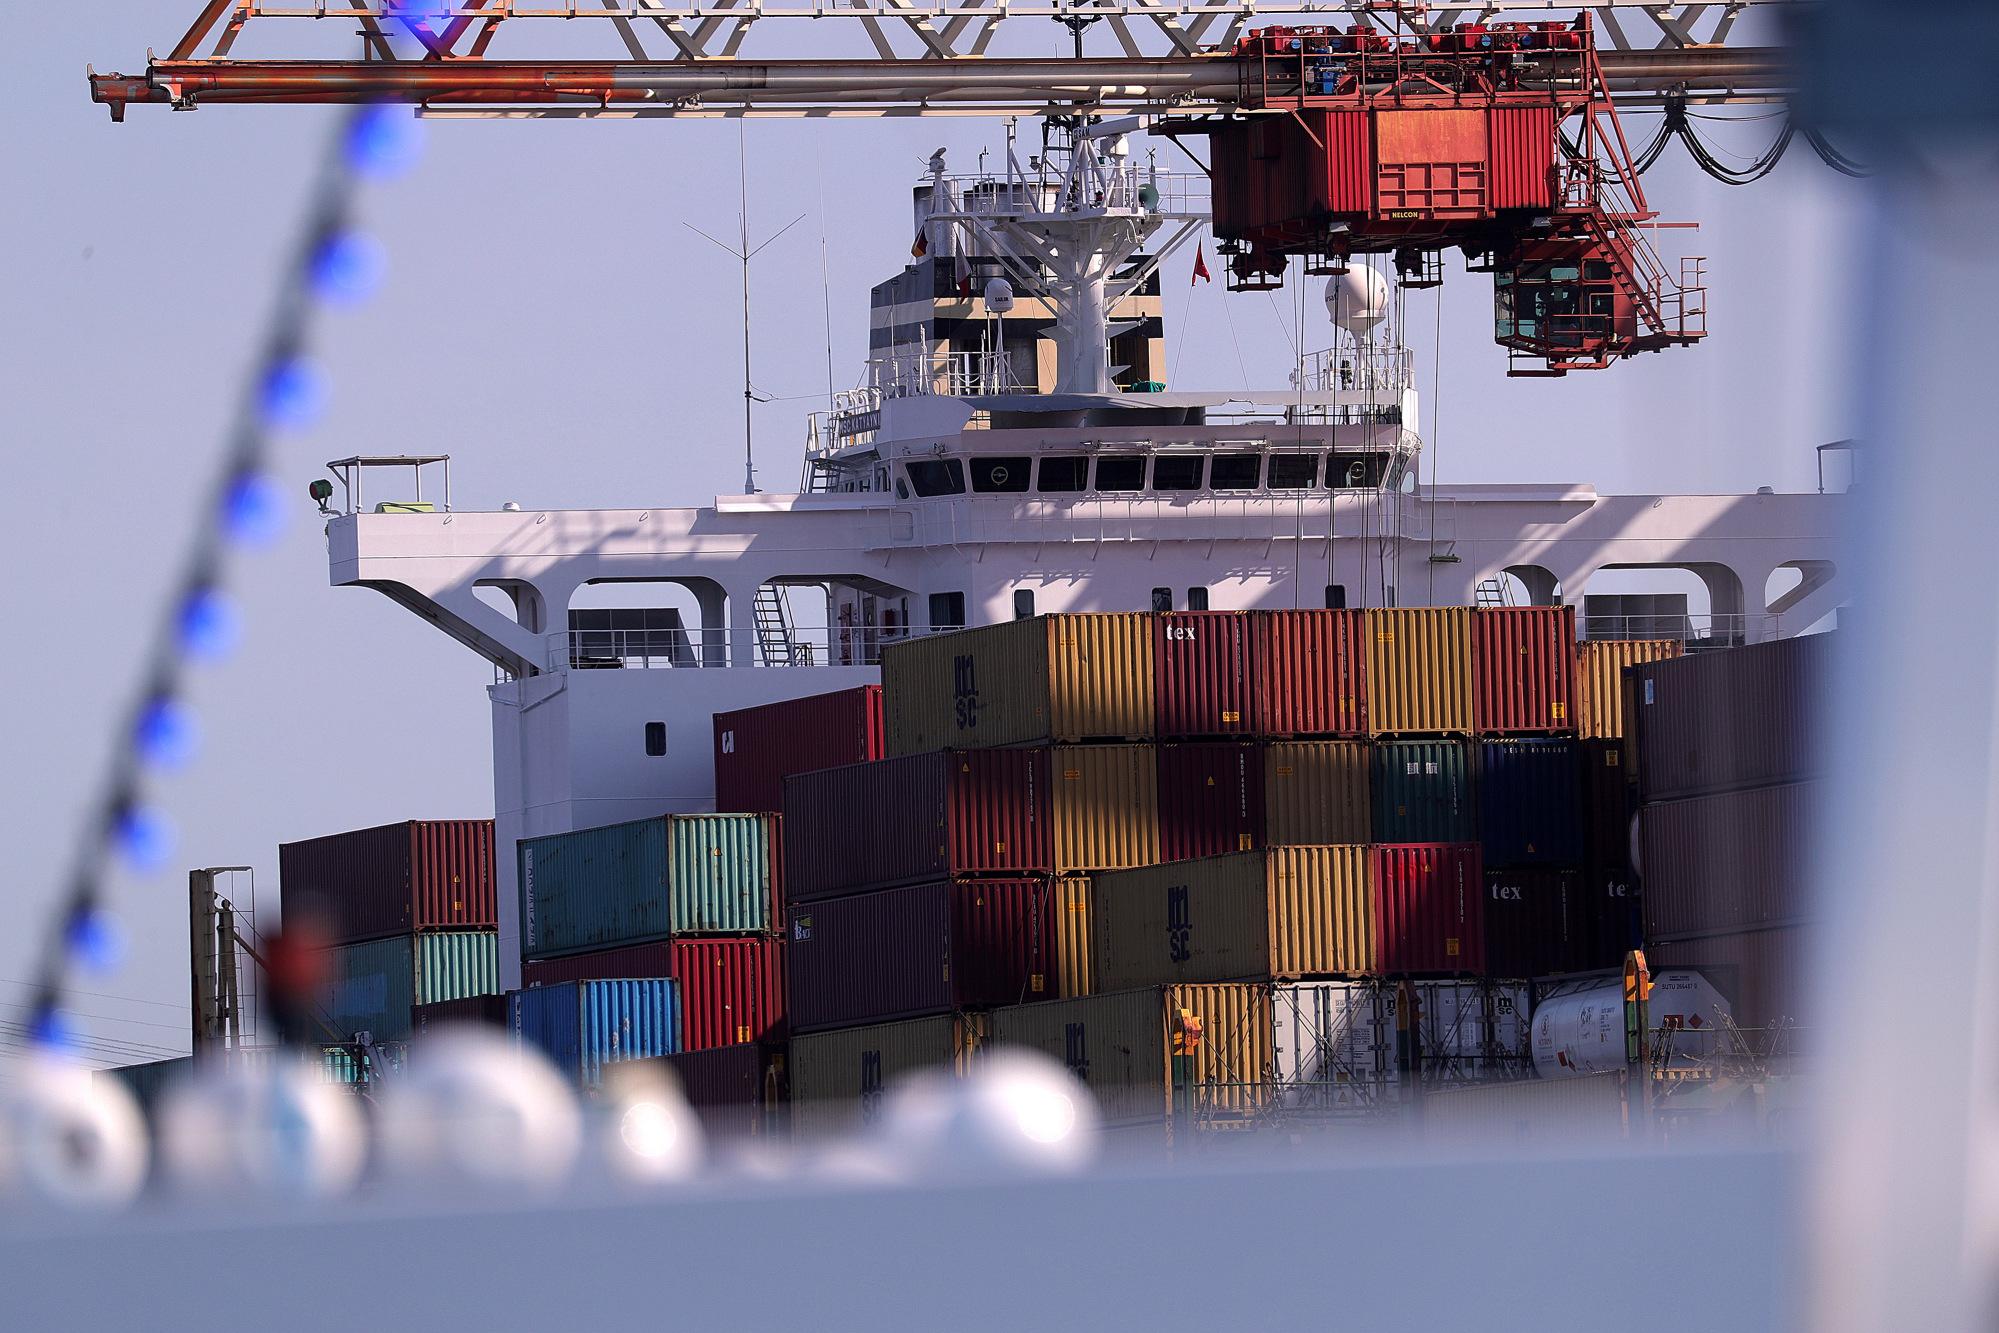 9eca7c0e1a0e6 EU Braces for a Trans-Atlantic Trade War - Bloomberg